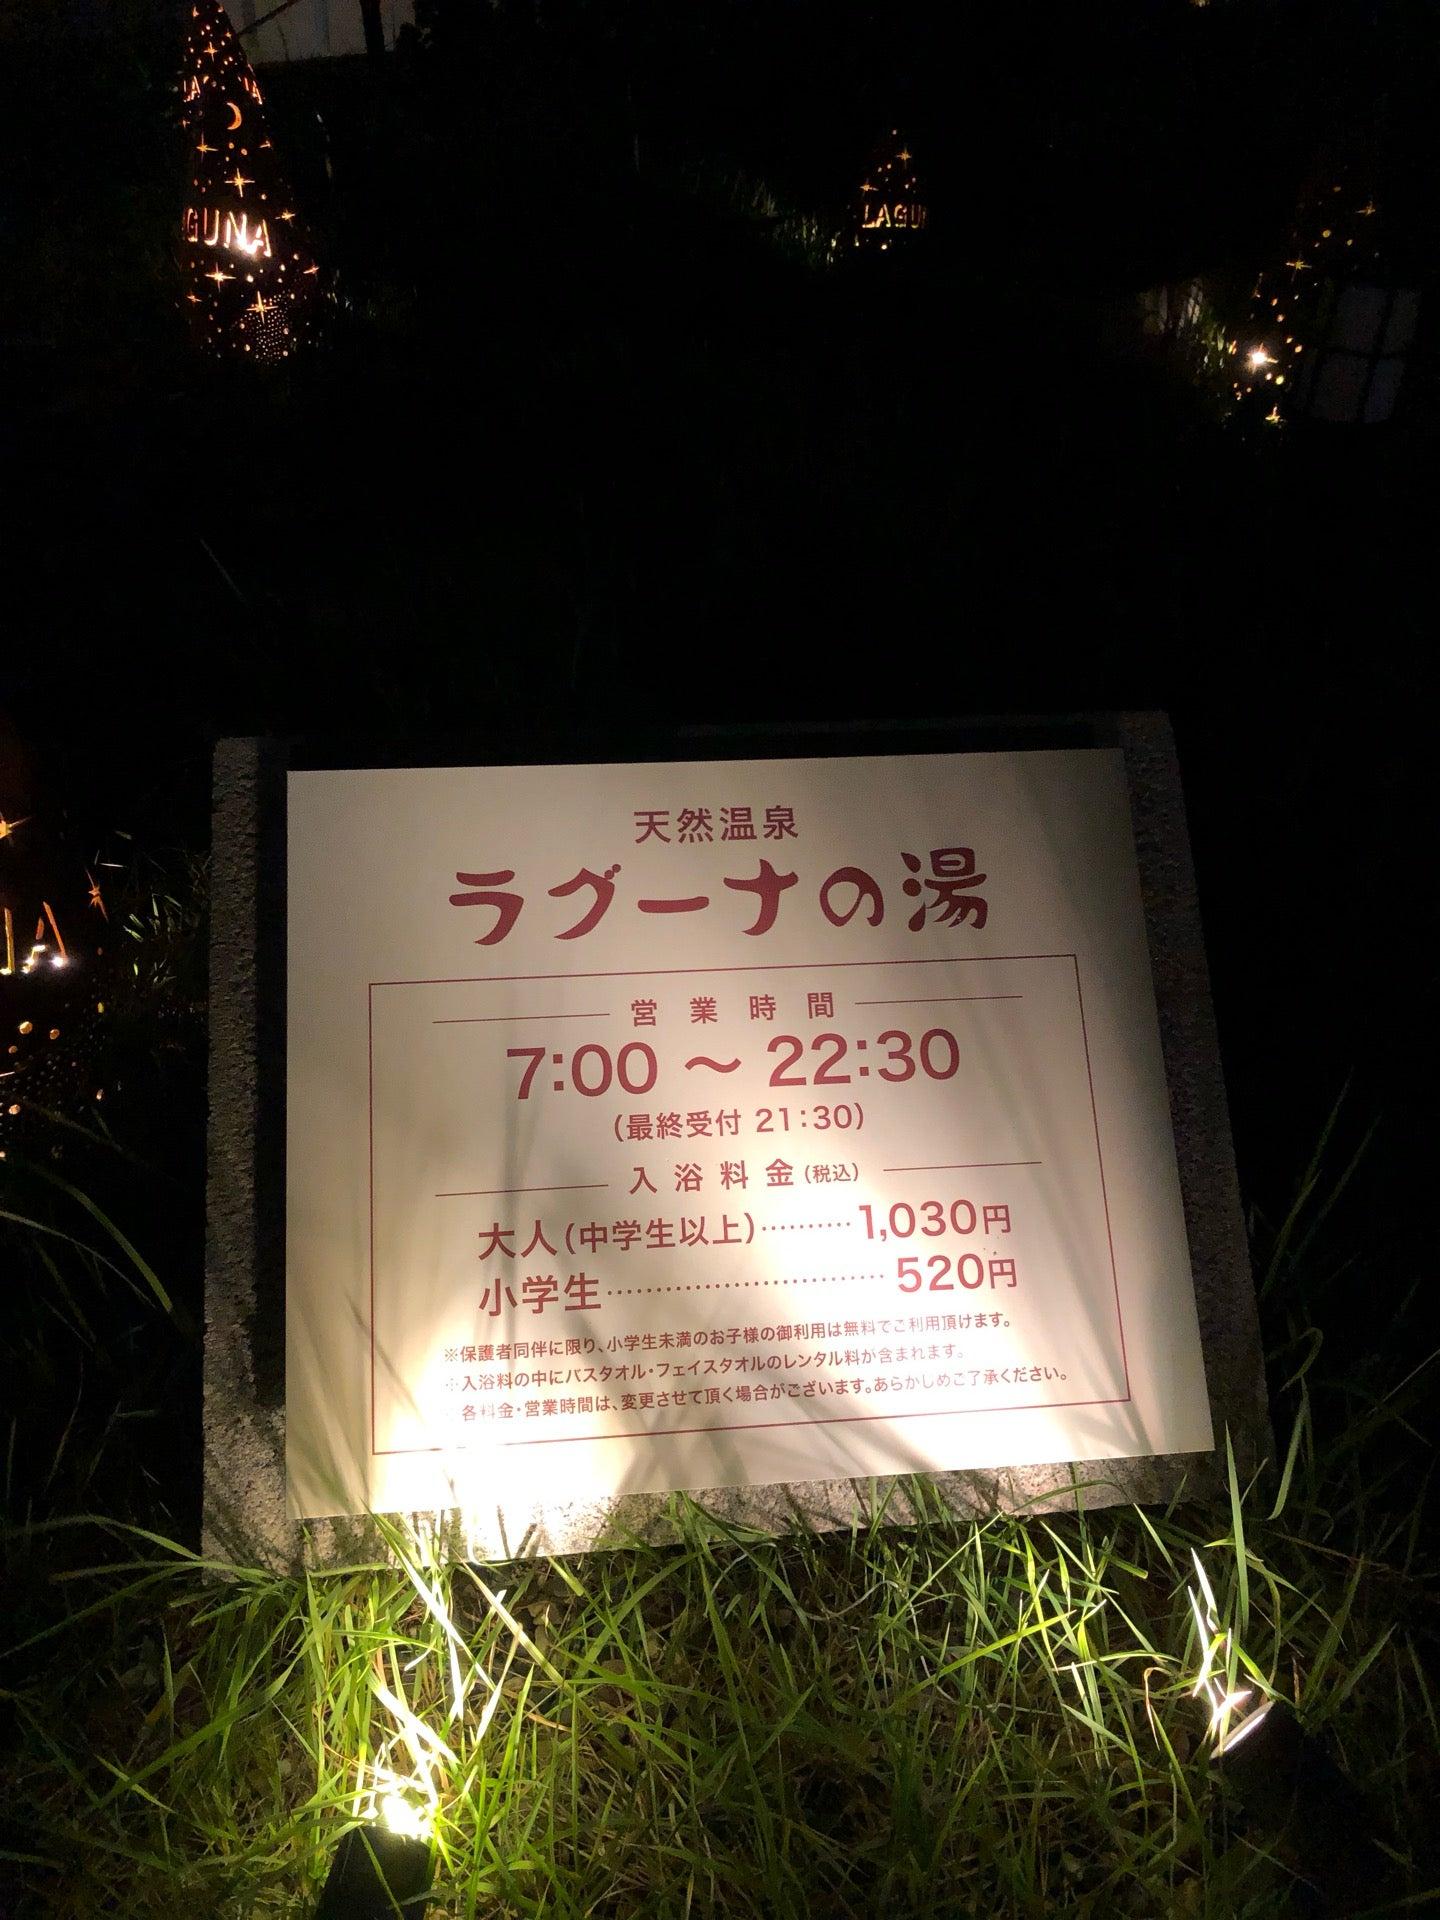 I'm at ラグーナの湯 - @lagunatenbosch in 蒲郡市, 愛知県 https://t.co/SlbyVzOeKS https://t.co/4hZcuwifGl